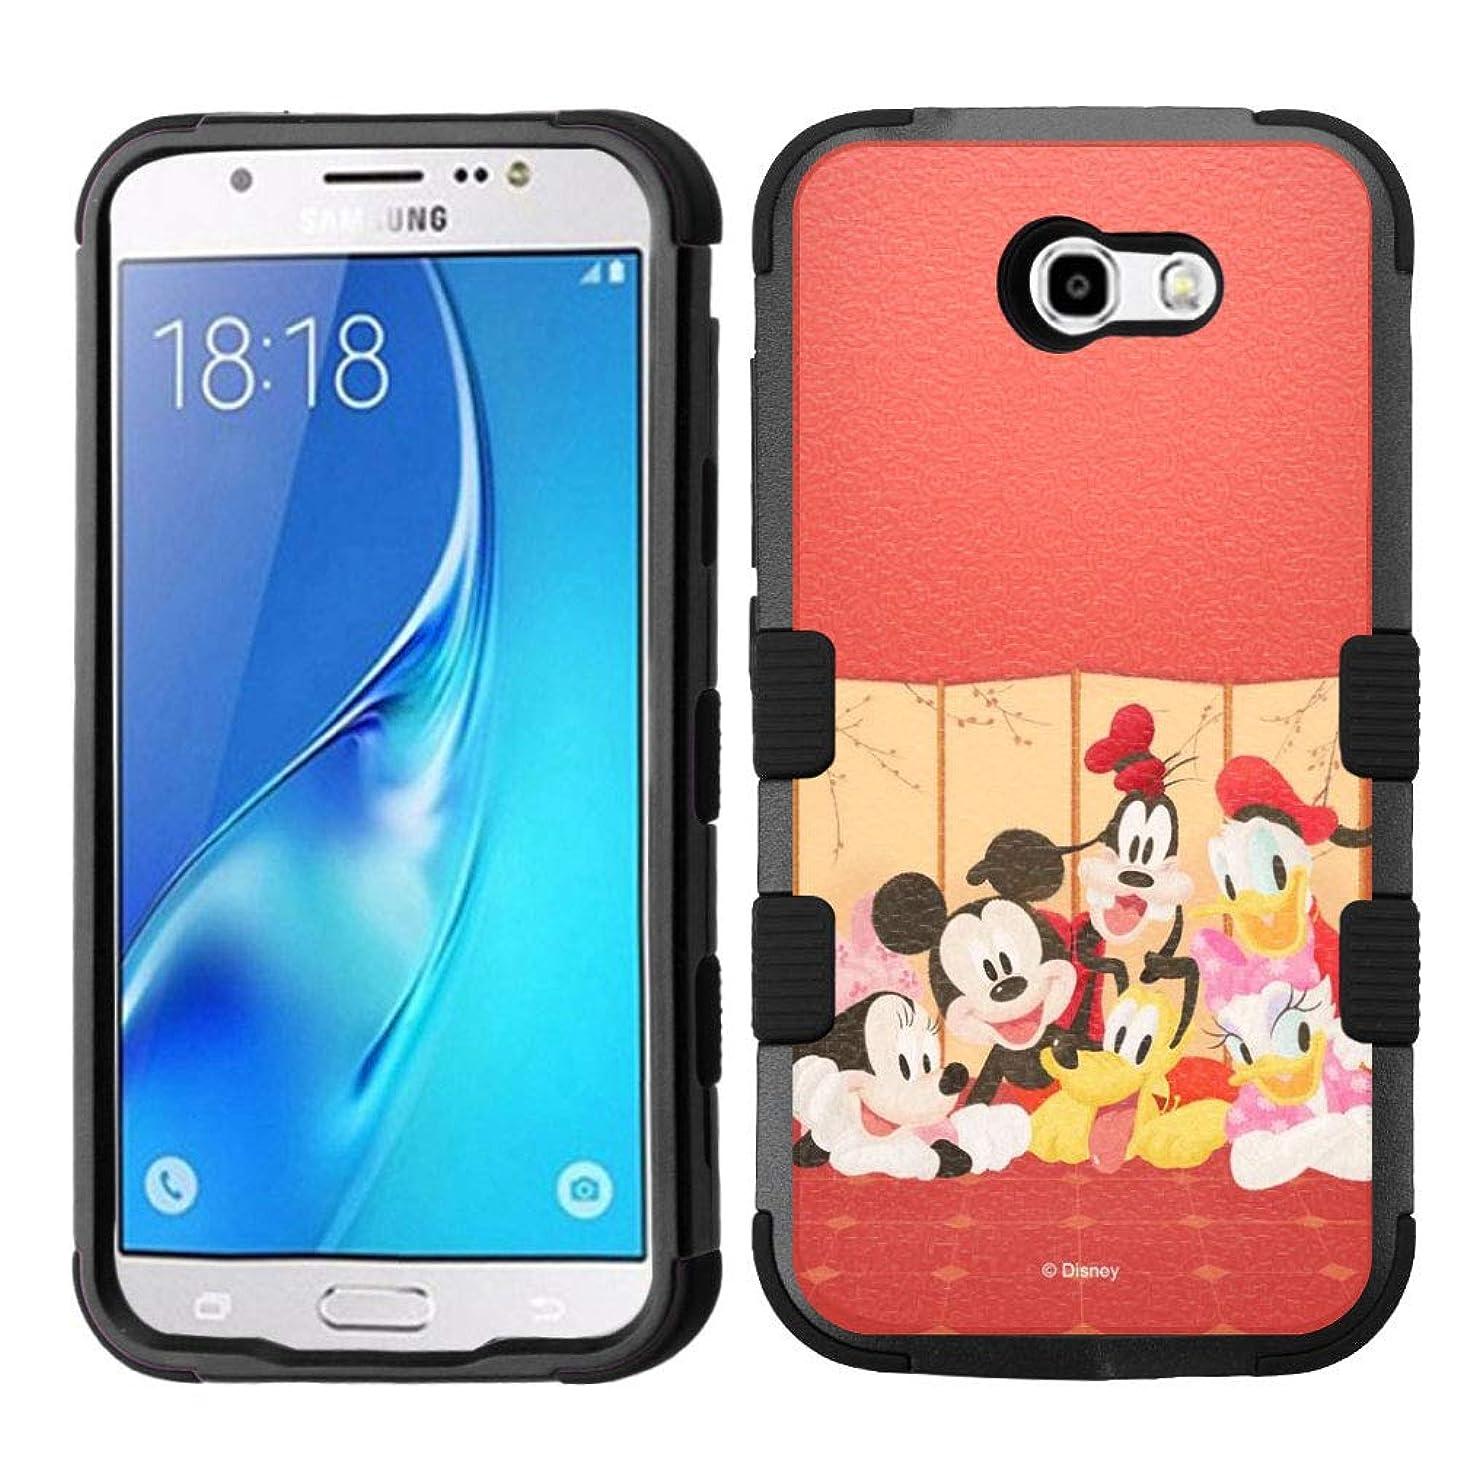 for Galaxy J7 Prime, J727 (2017), Galaxy J7 V, Galaxy J7 Perx, Galaxy J7 Sky Pro, Hard+Rubber Rugged Impact Cover Case - Mickey Minnie Mouse Goofy Doland Duck #R